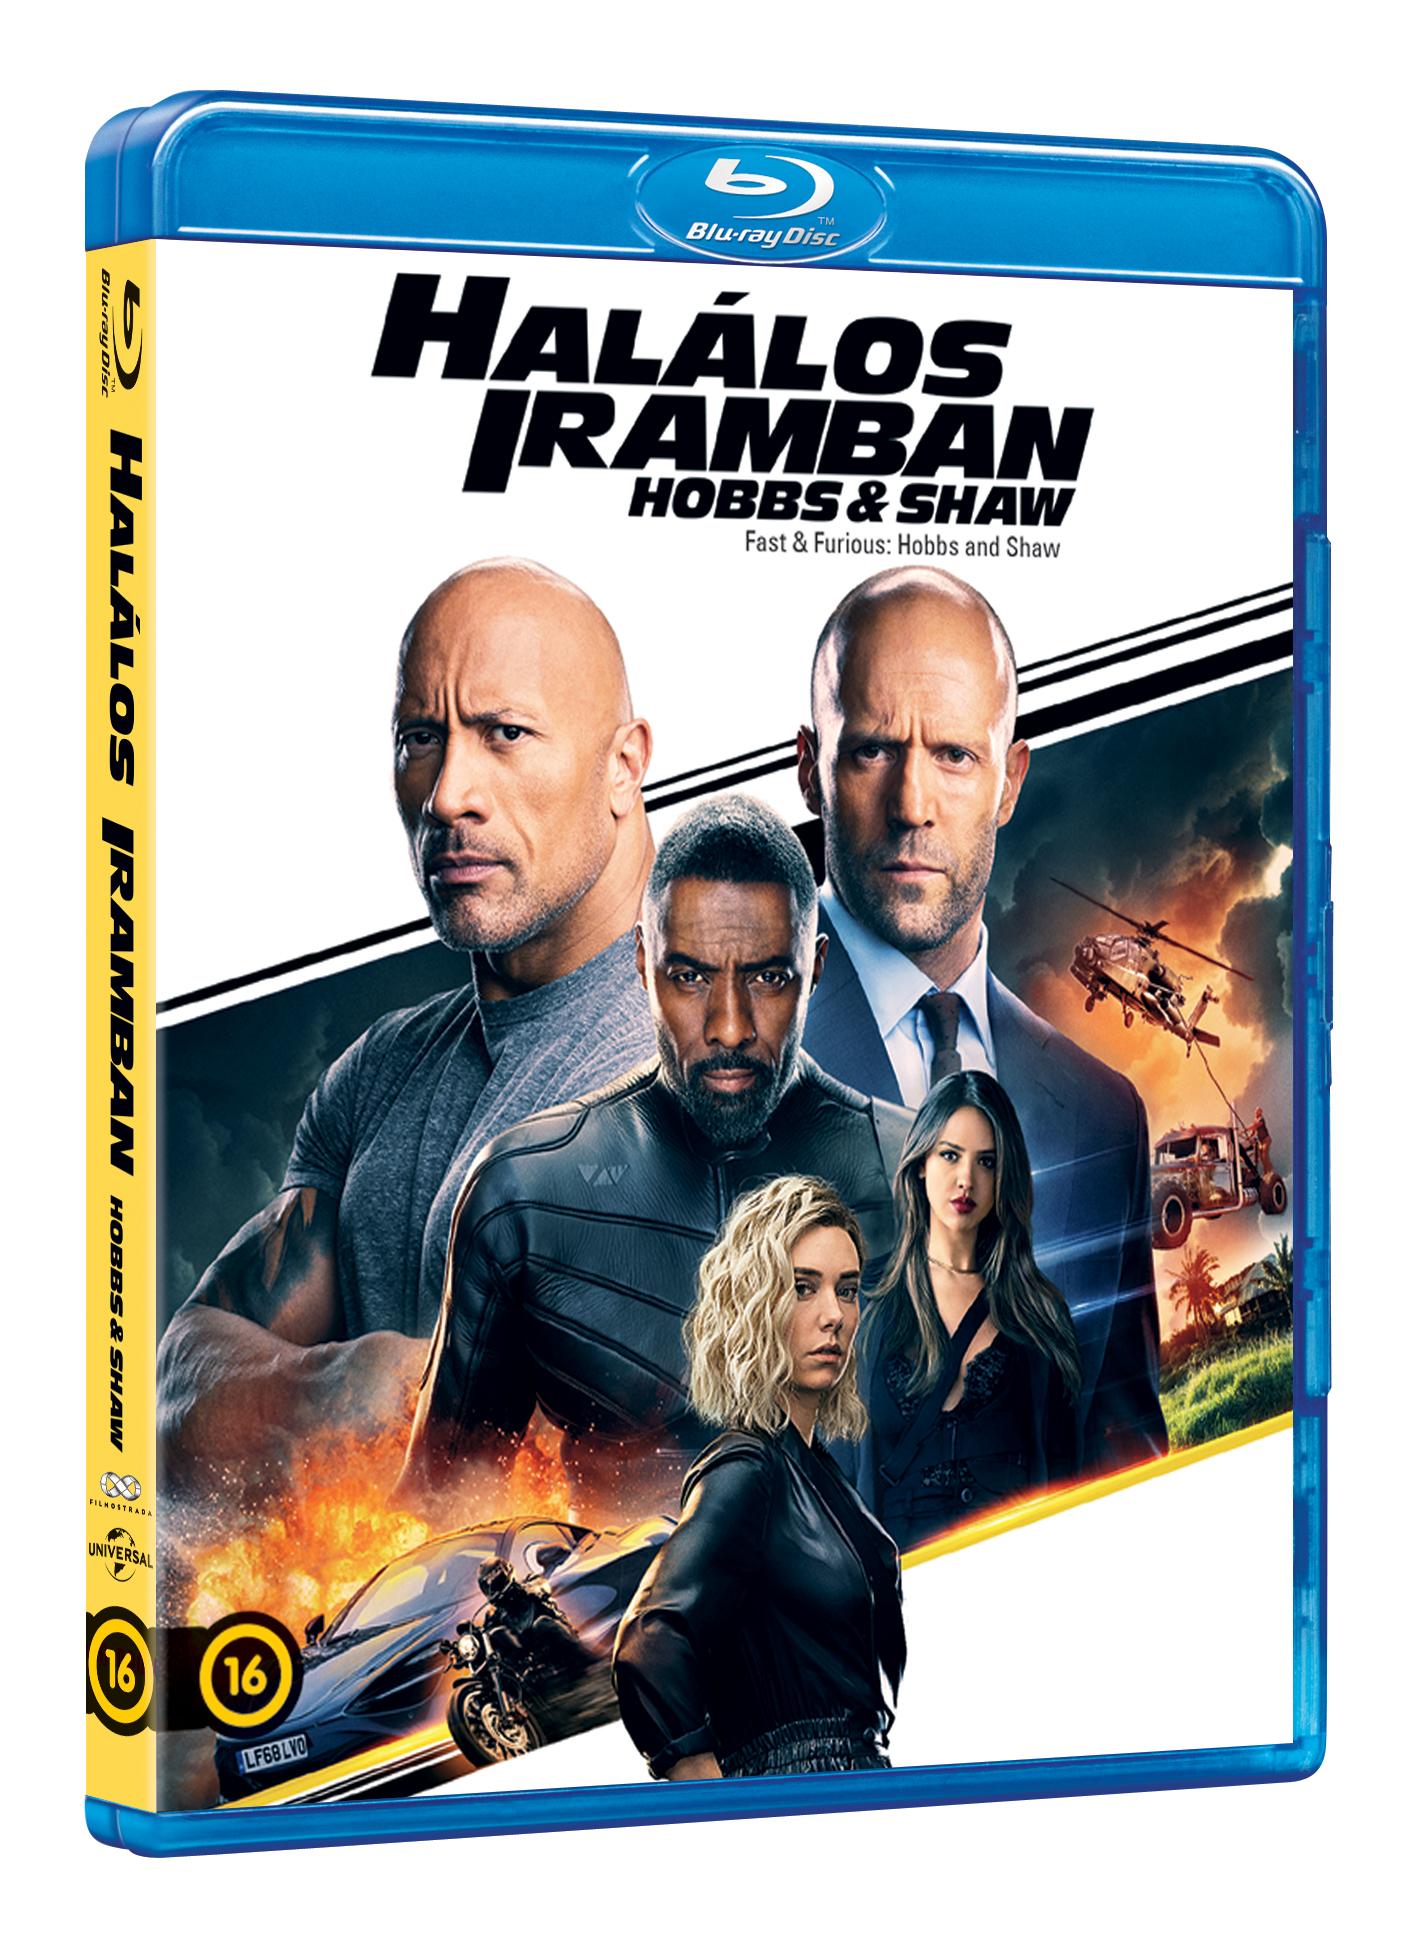 Halálos iramban: Hobbs és Shaw - Blu-Ray